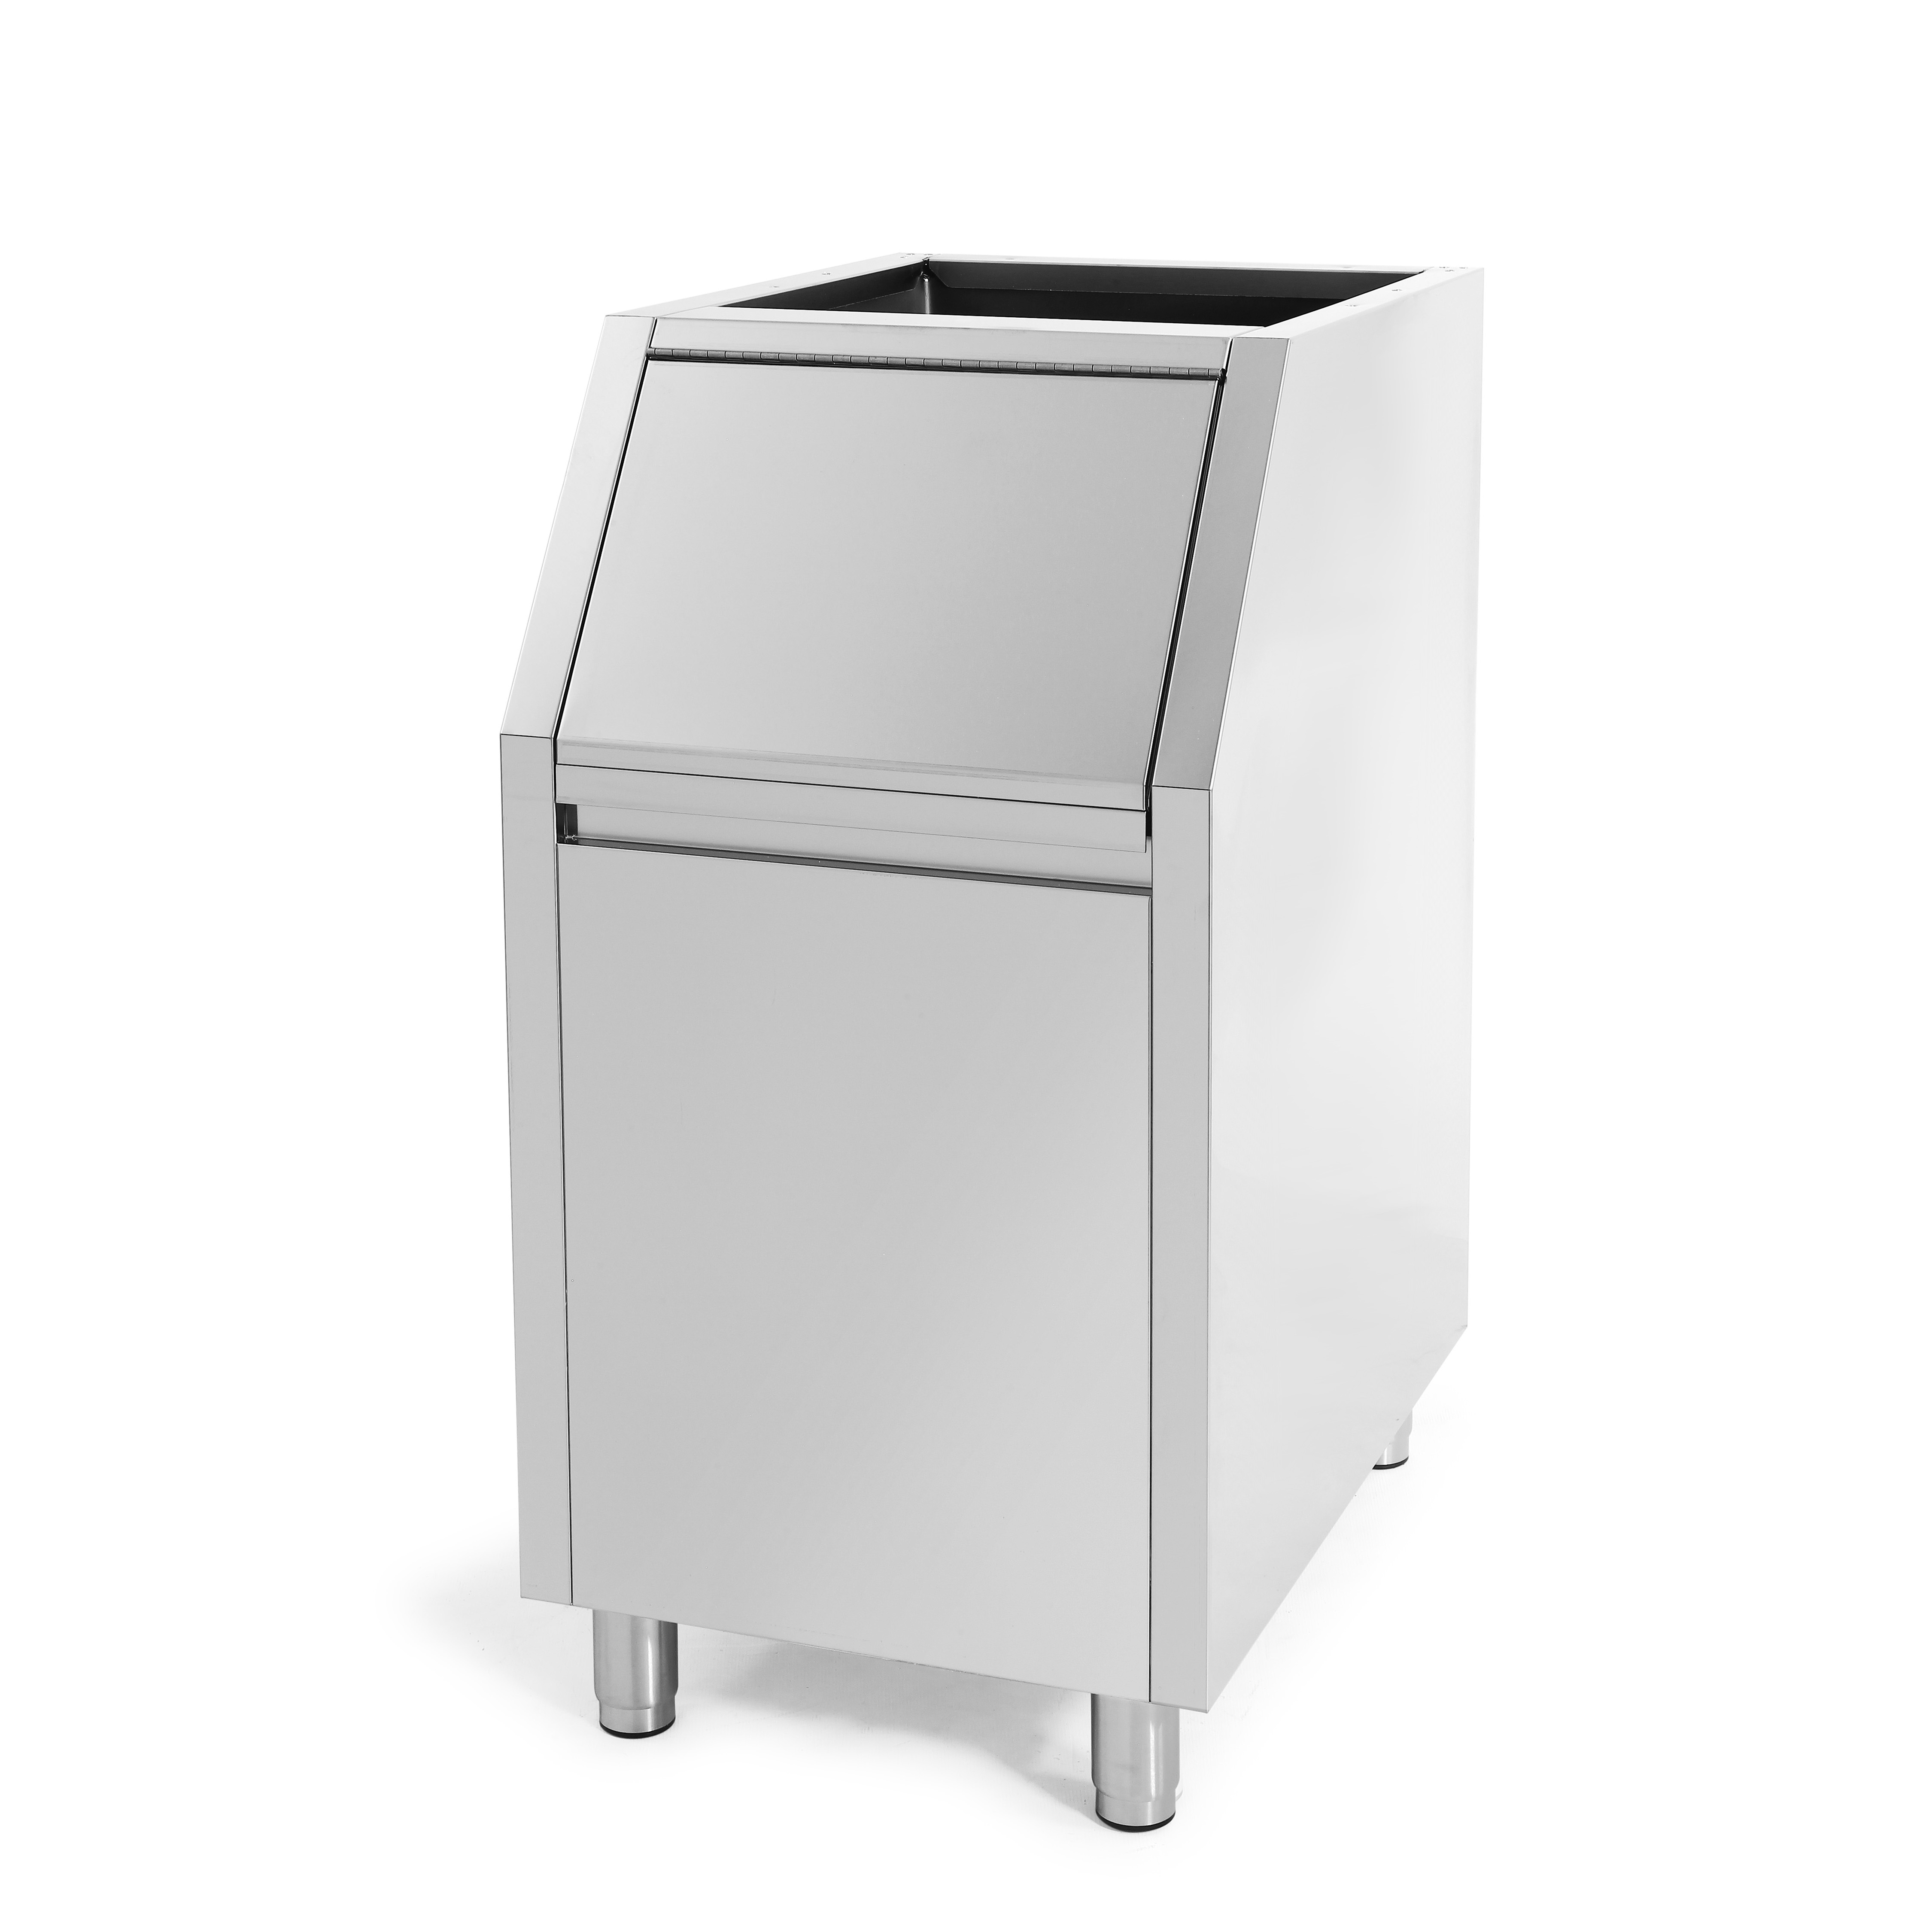 Eurodib USA BIN110 ice bin for ice machines